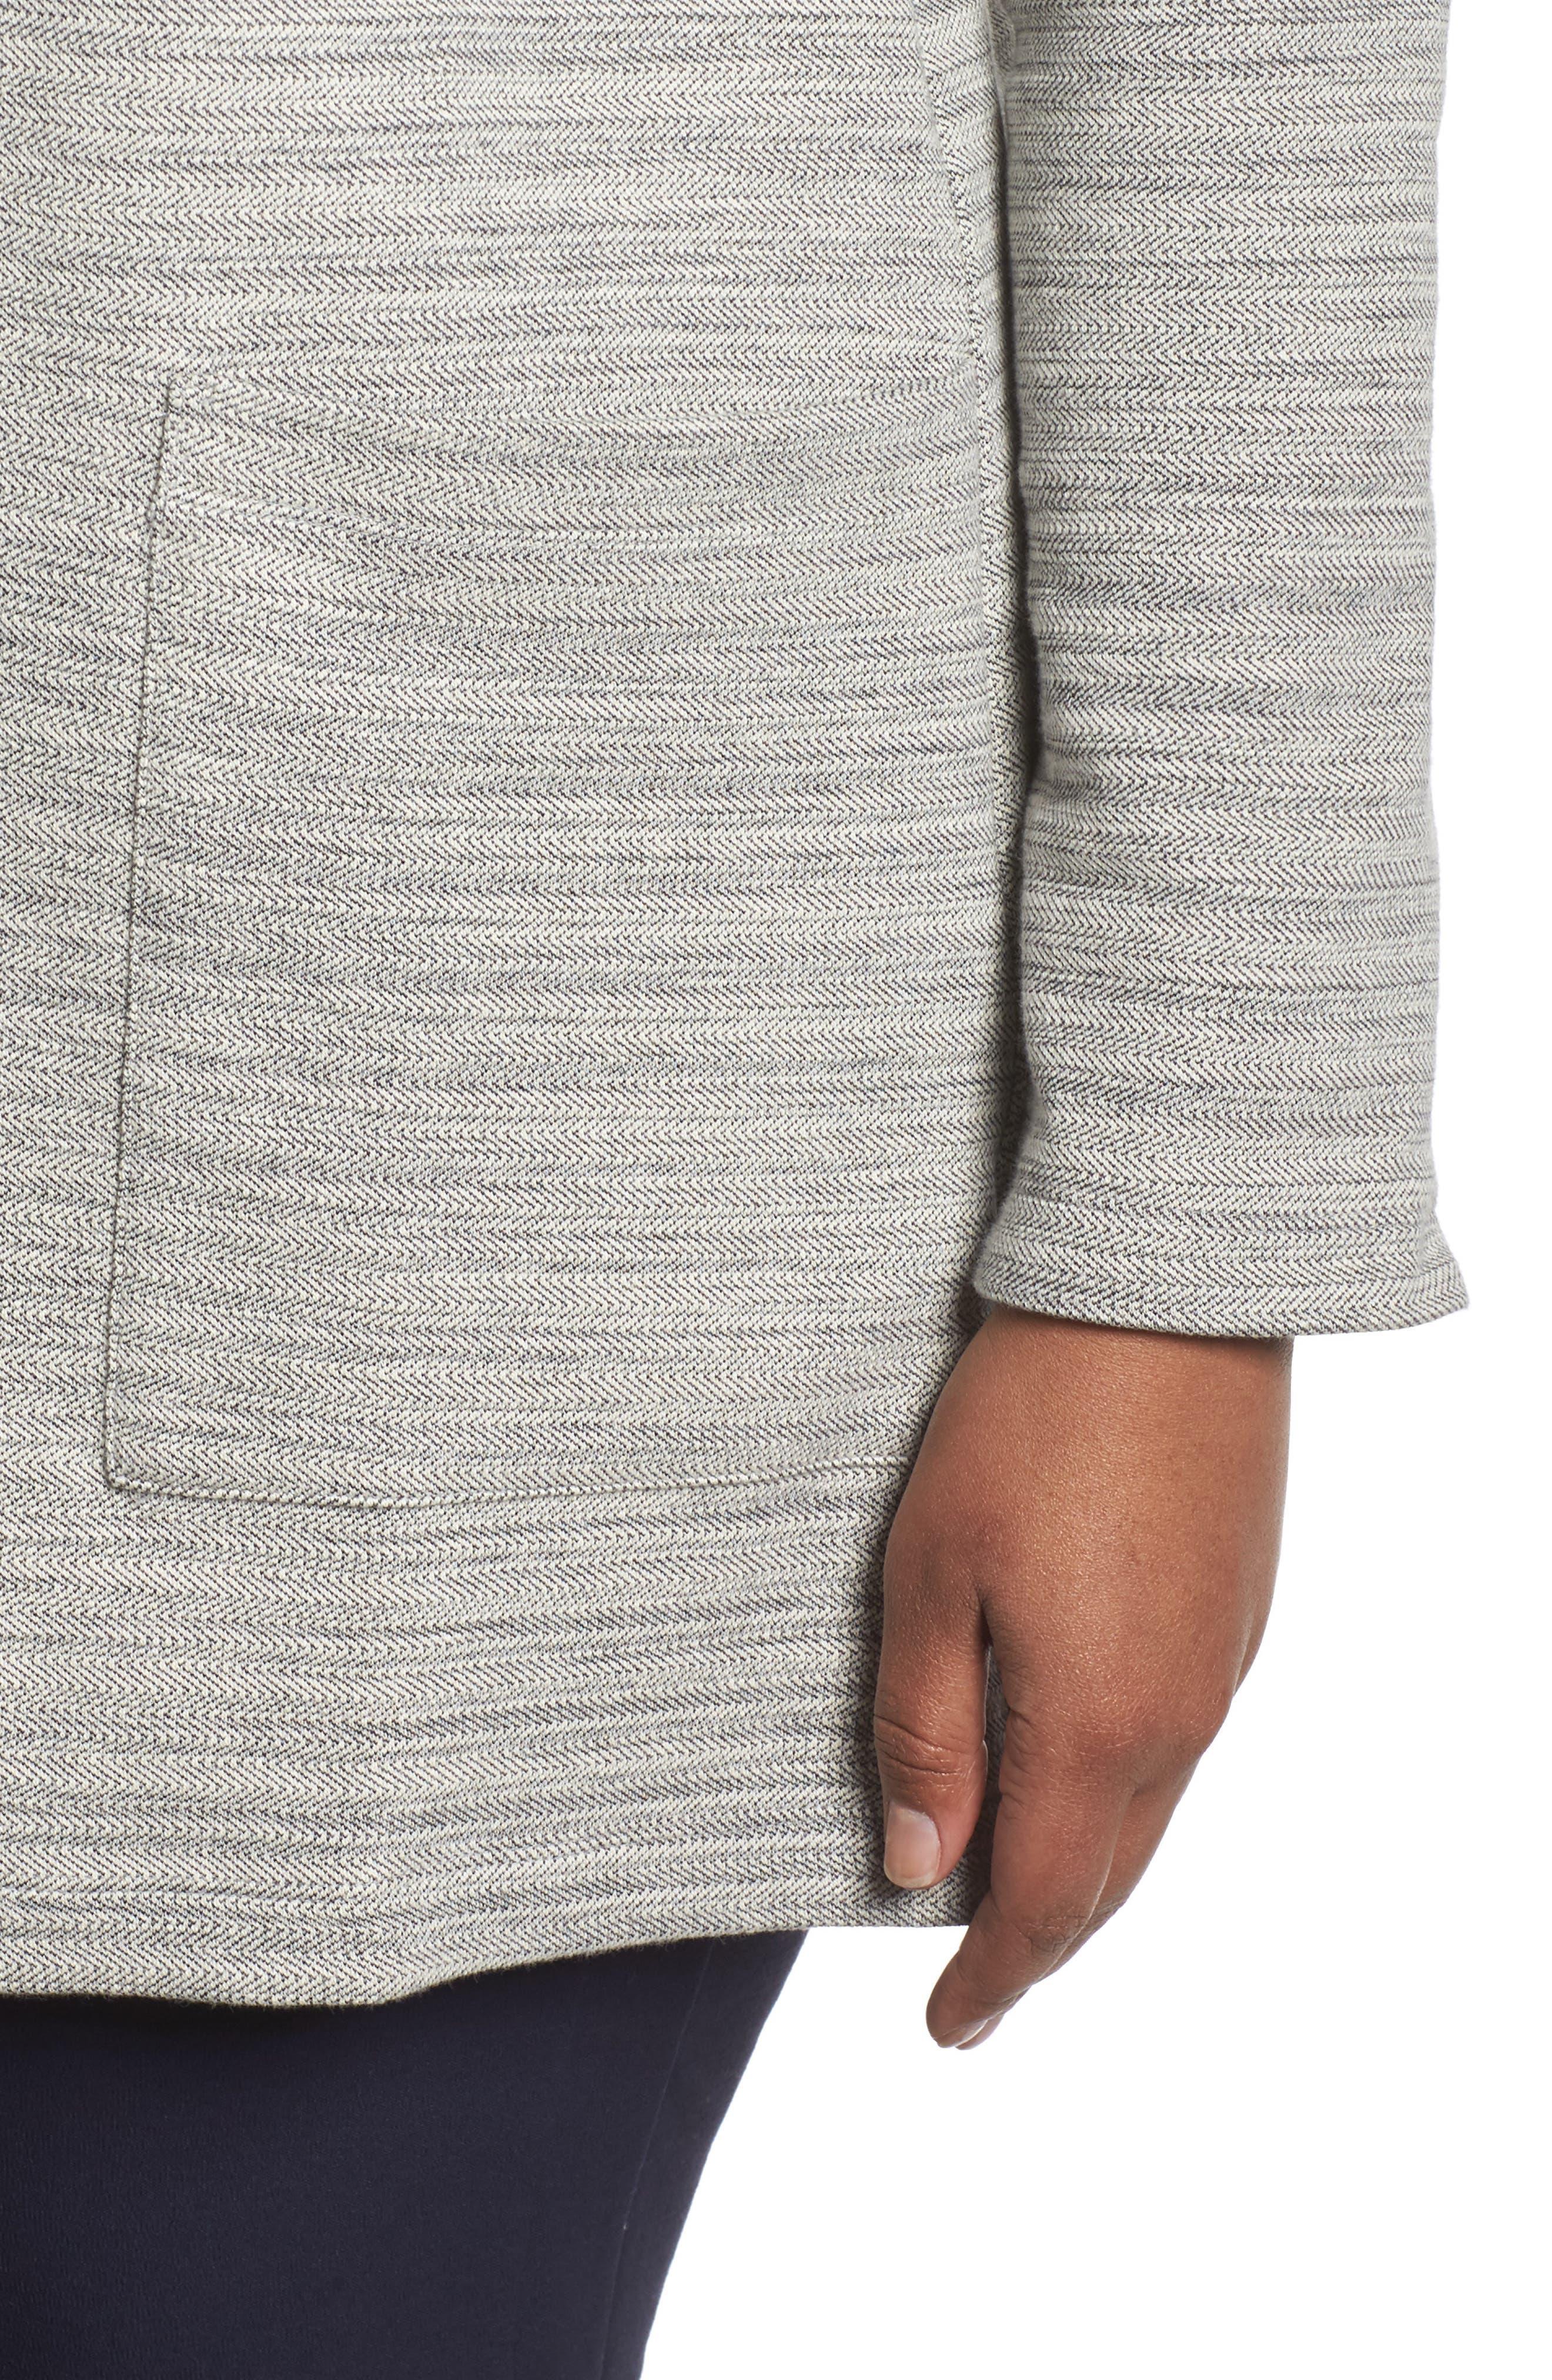 Cotton Blend Tweed Jacket,                             Alternate thumbnail 4, color,                             022